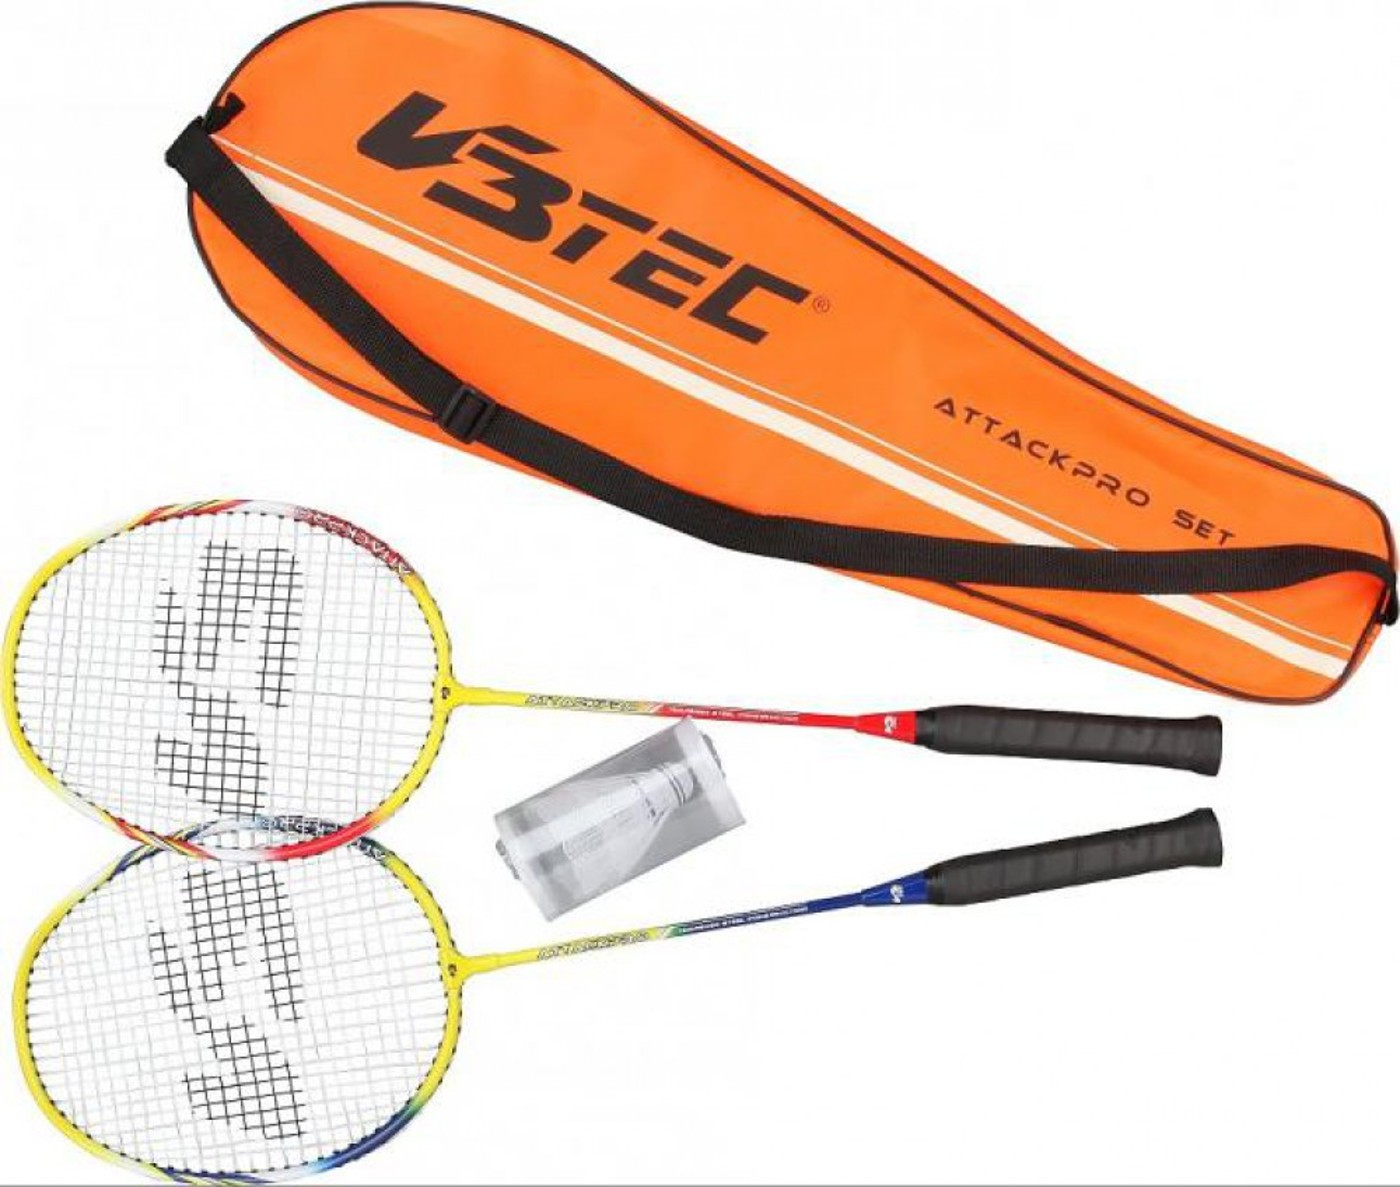 V3TEC Badmintonset ATTACK PRO